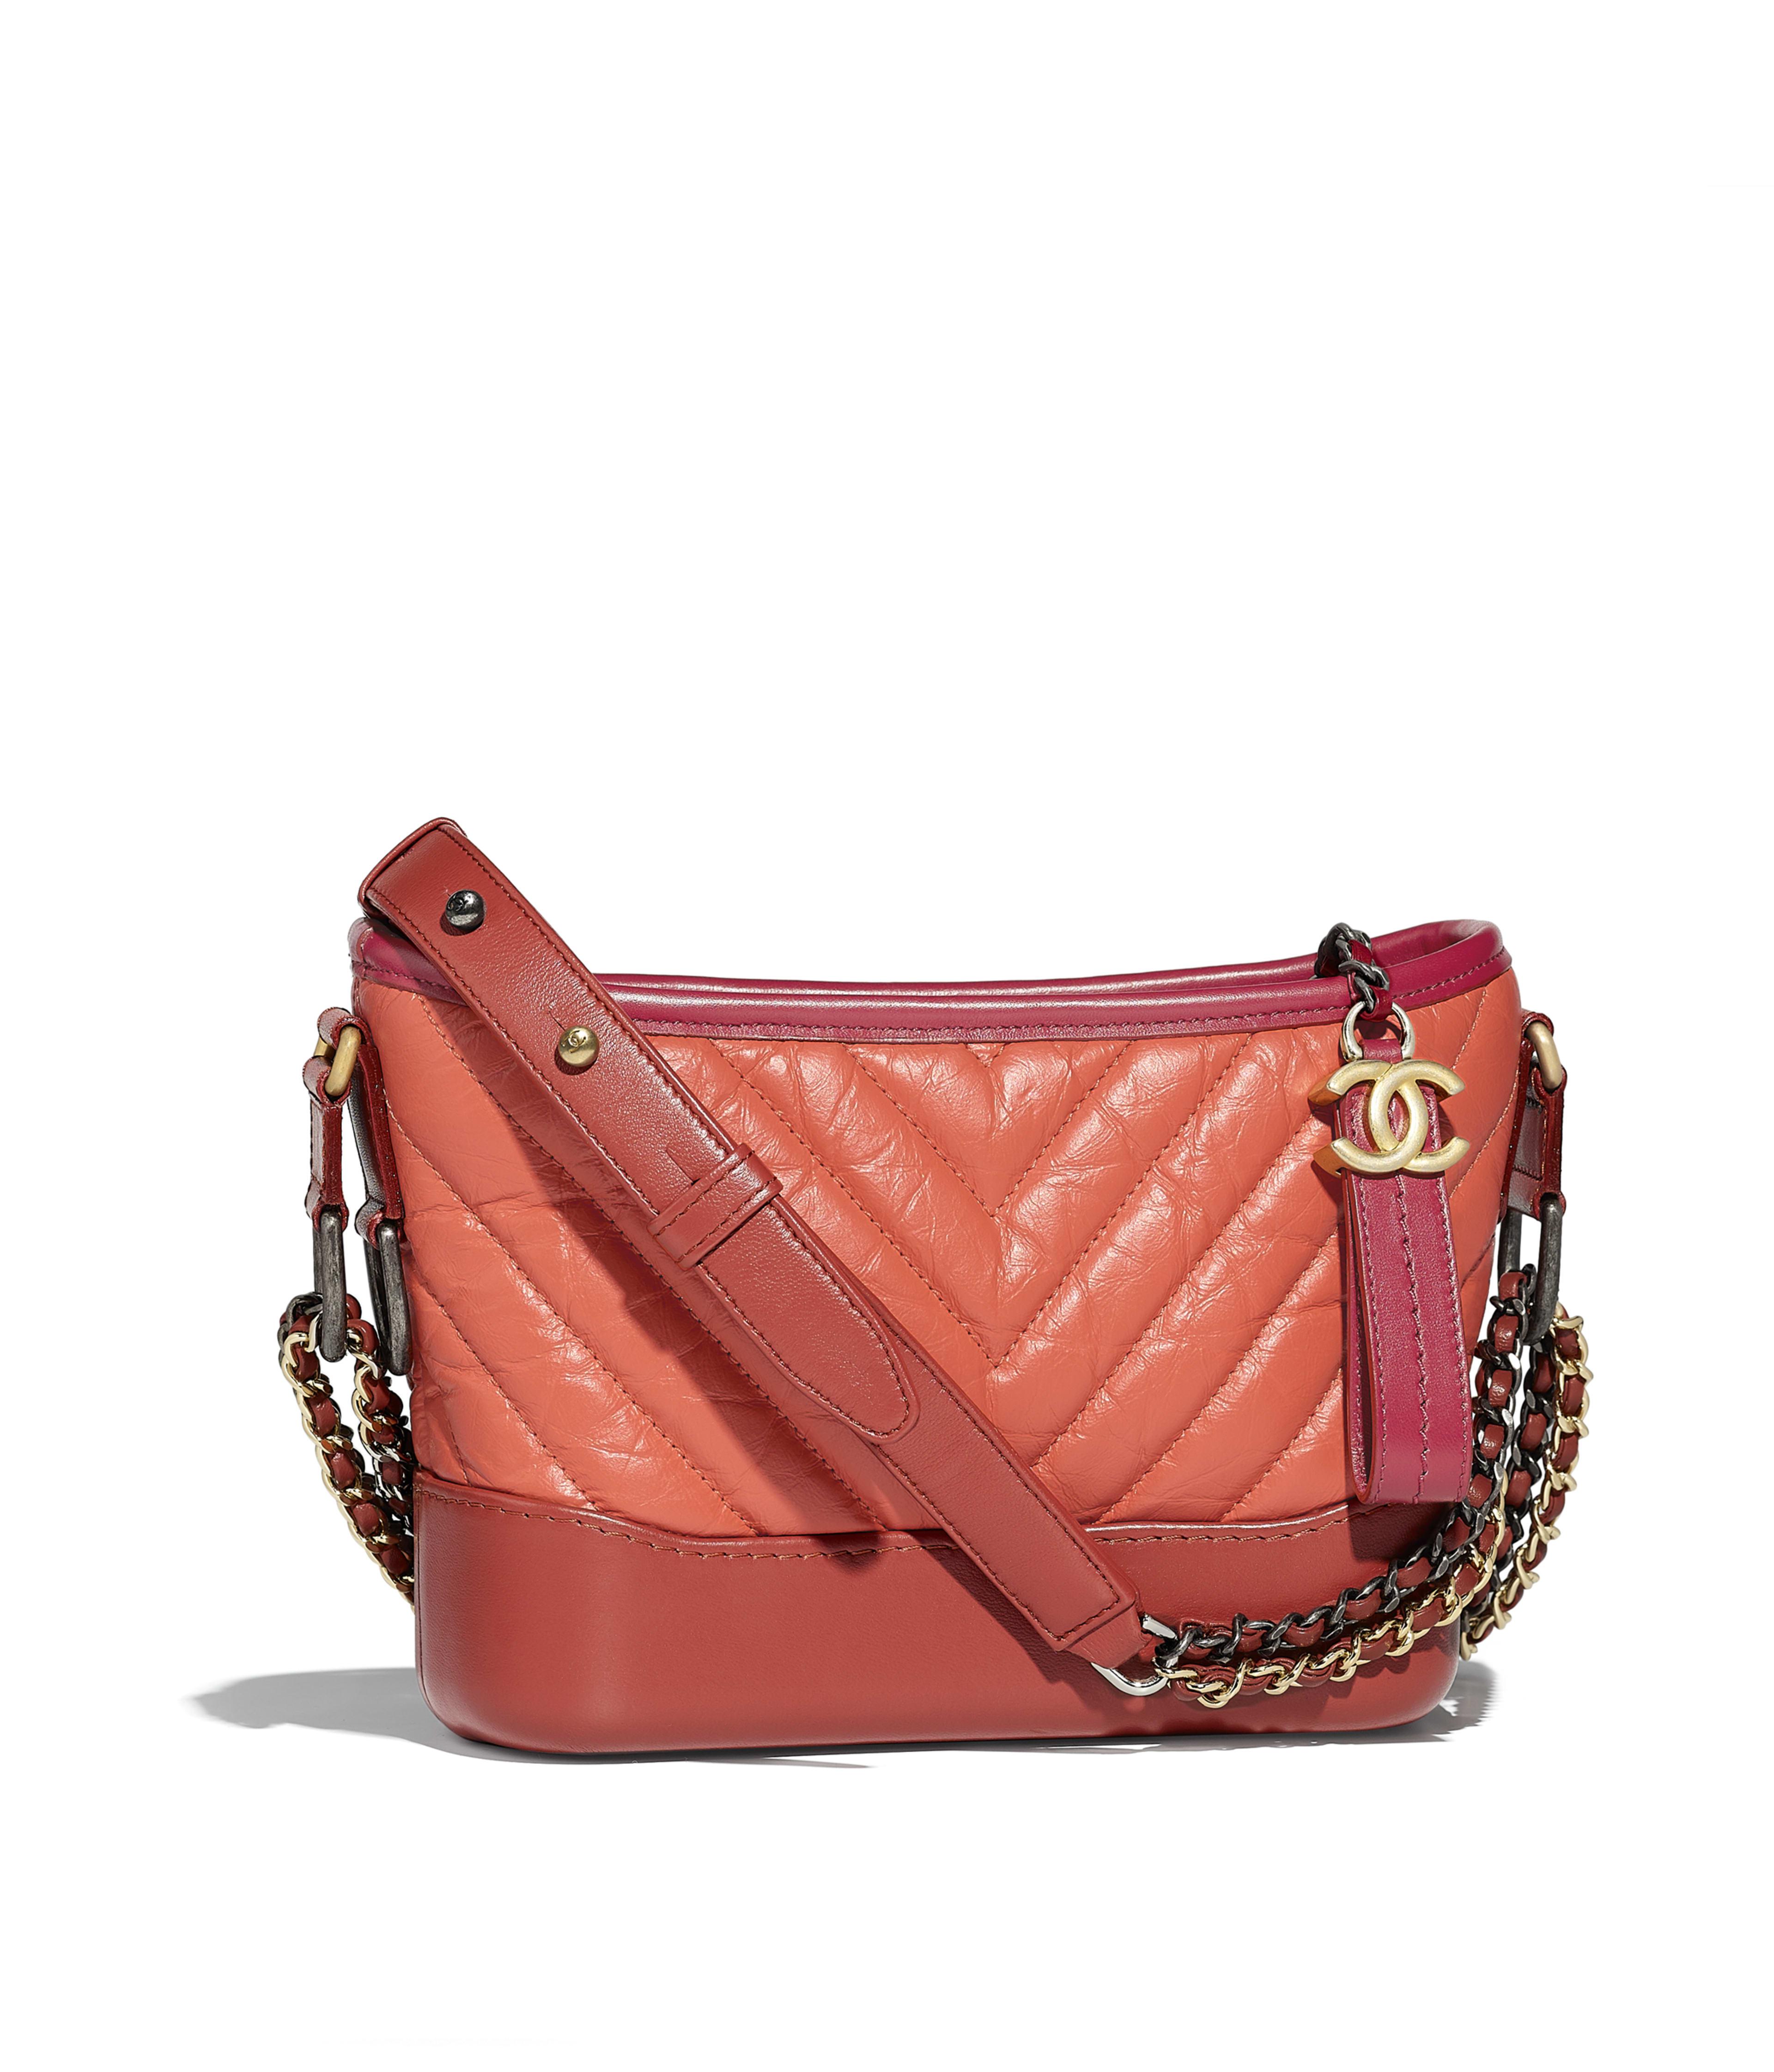 Chanel S Gabrielle Small Hobo Bag Aged Calfskin Smooth Silver Tone Gold Metal Orange Dark Red Ref A91810y83983k1164